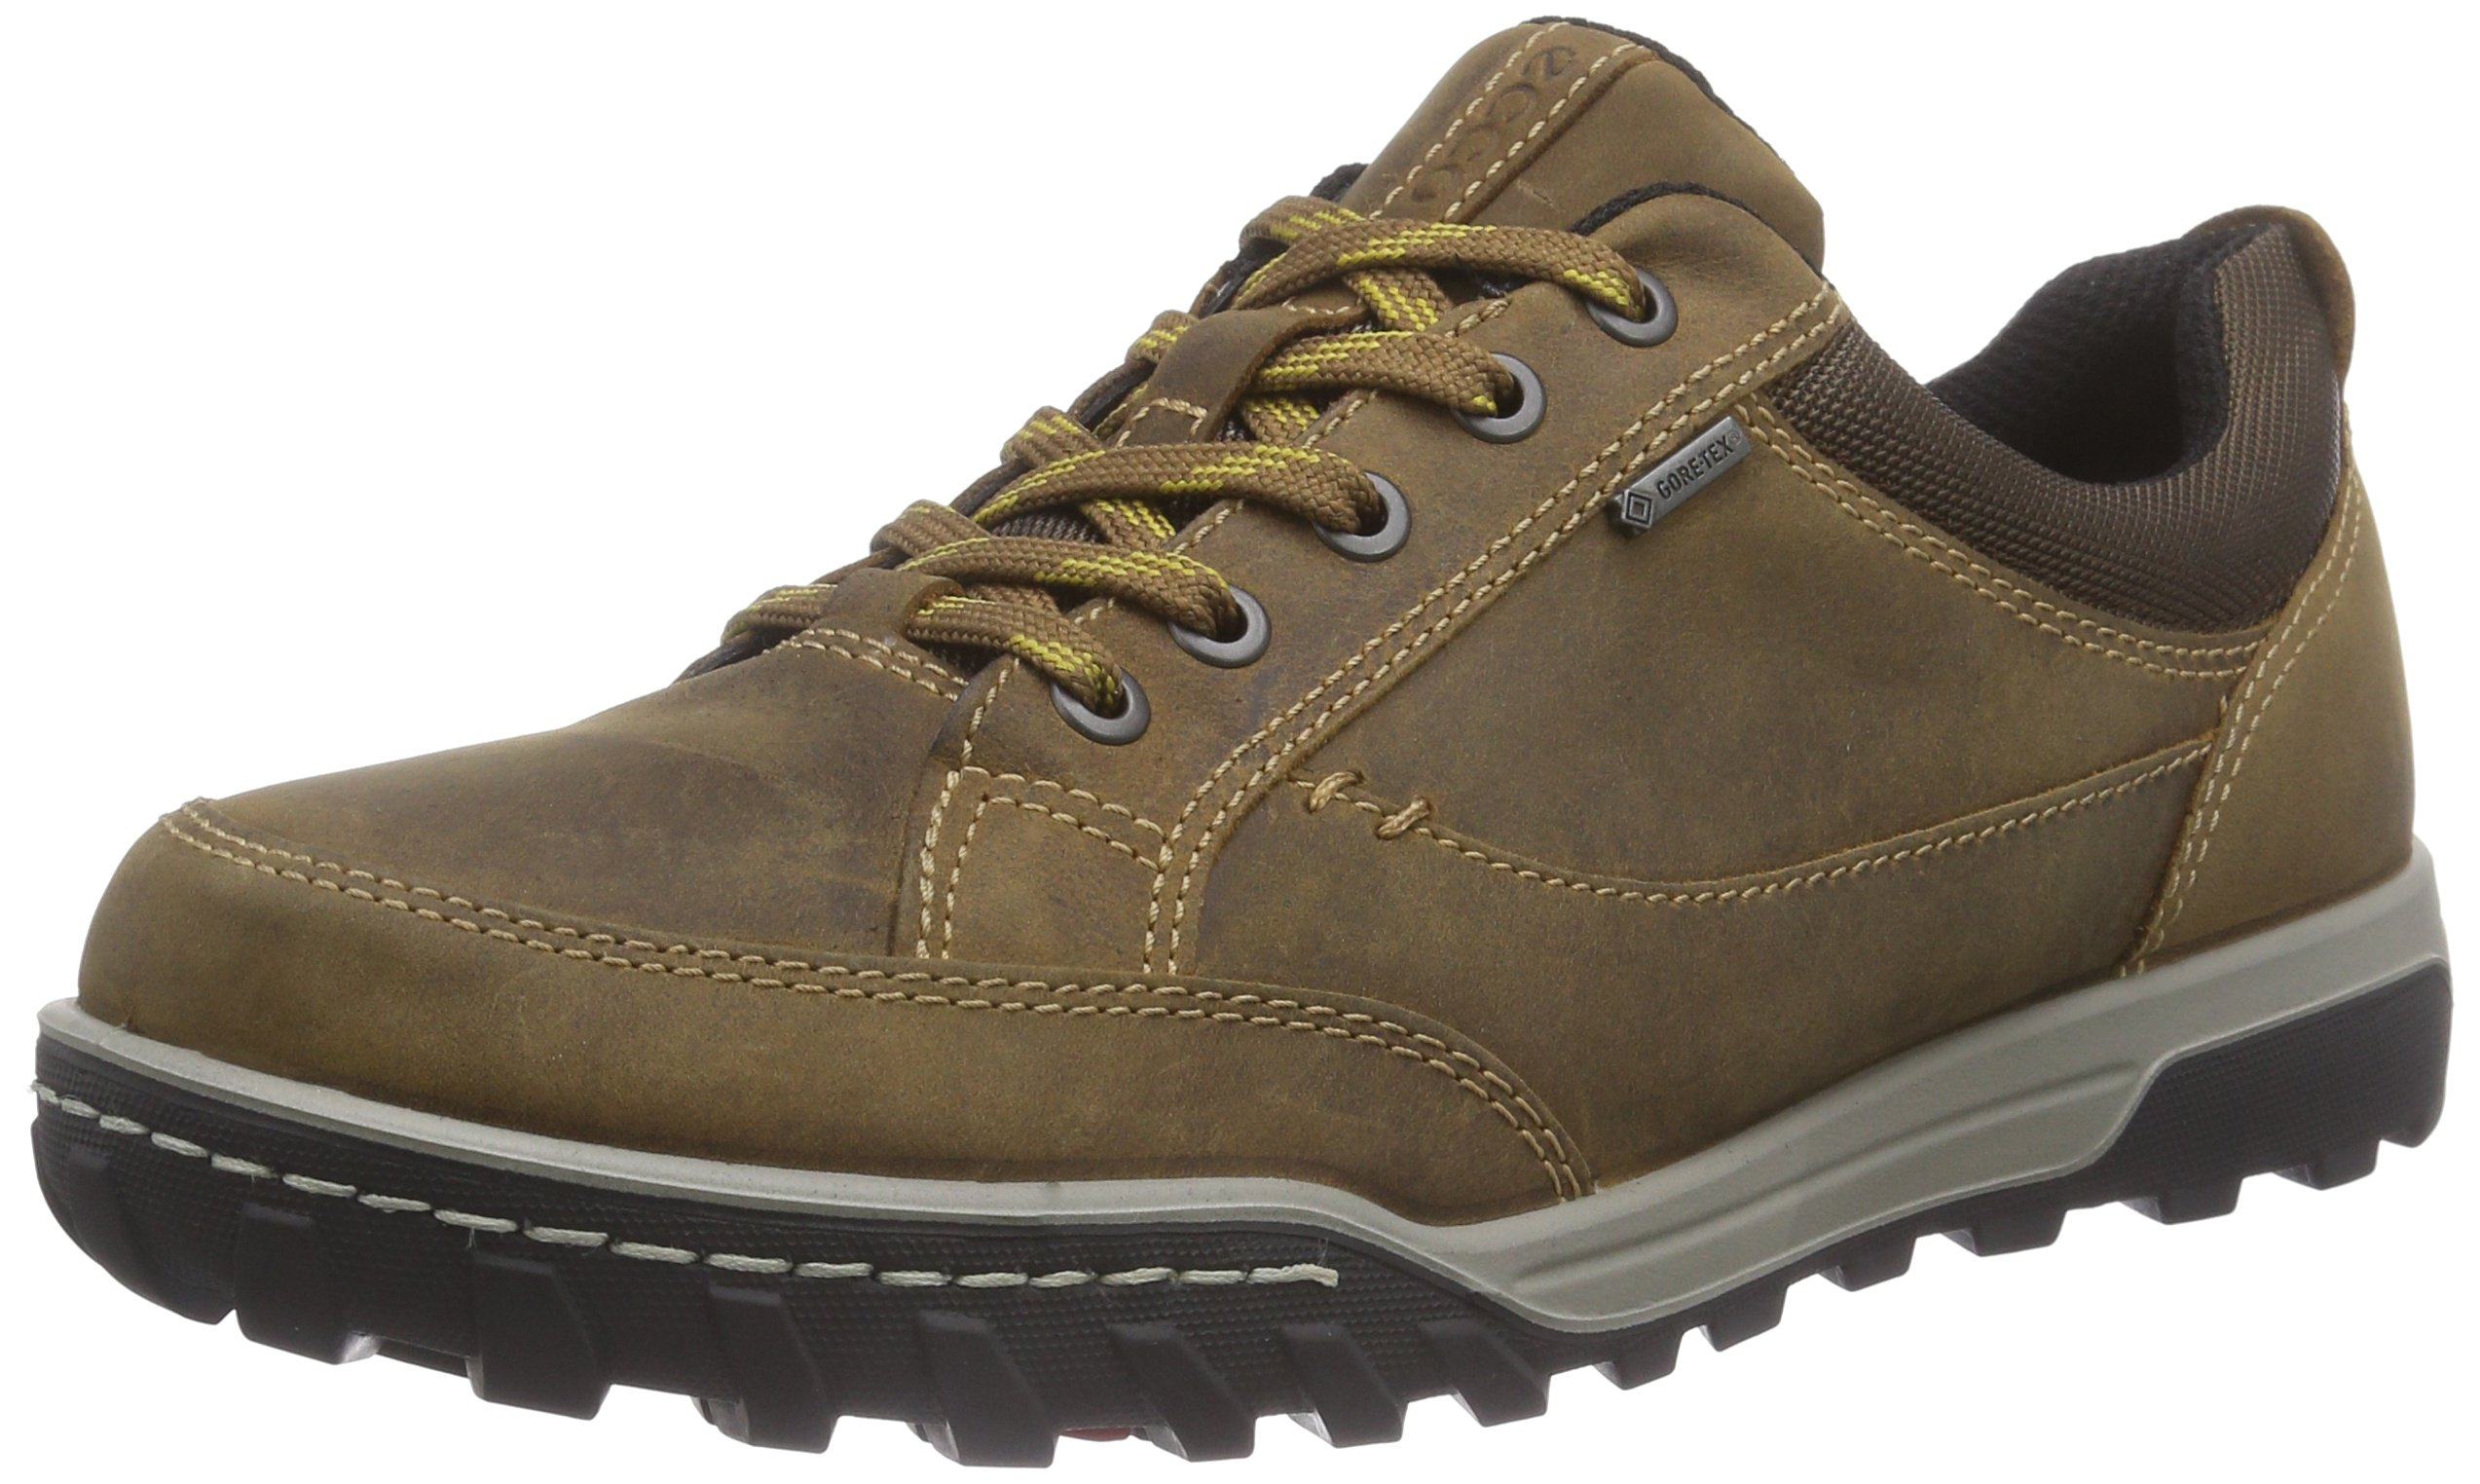 ECCO Men's Urban Lifestyle Gore-tex Hiking Shoe, Camel/Cocoa Brown, 43 EU/10-10.5 M US